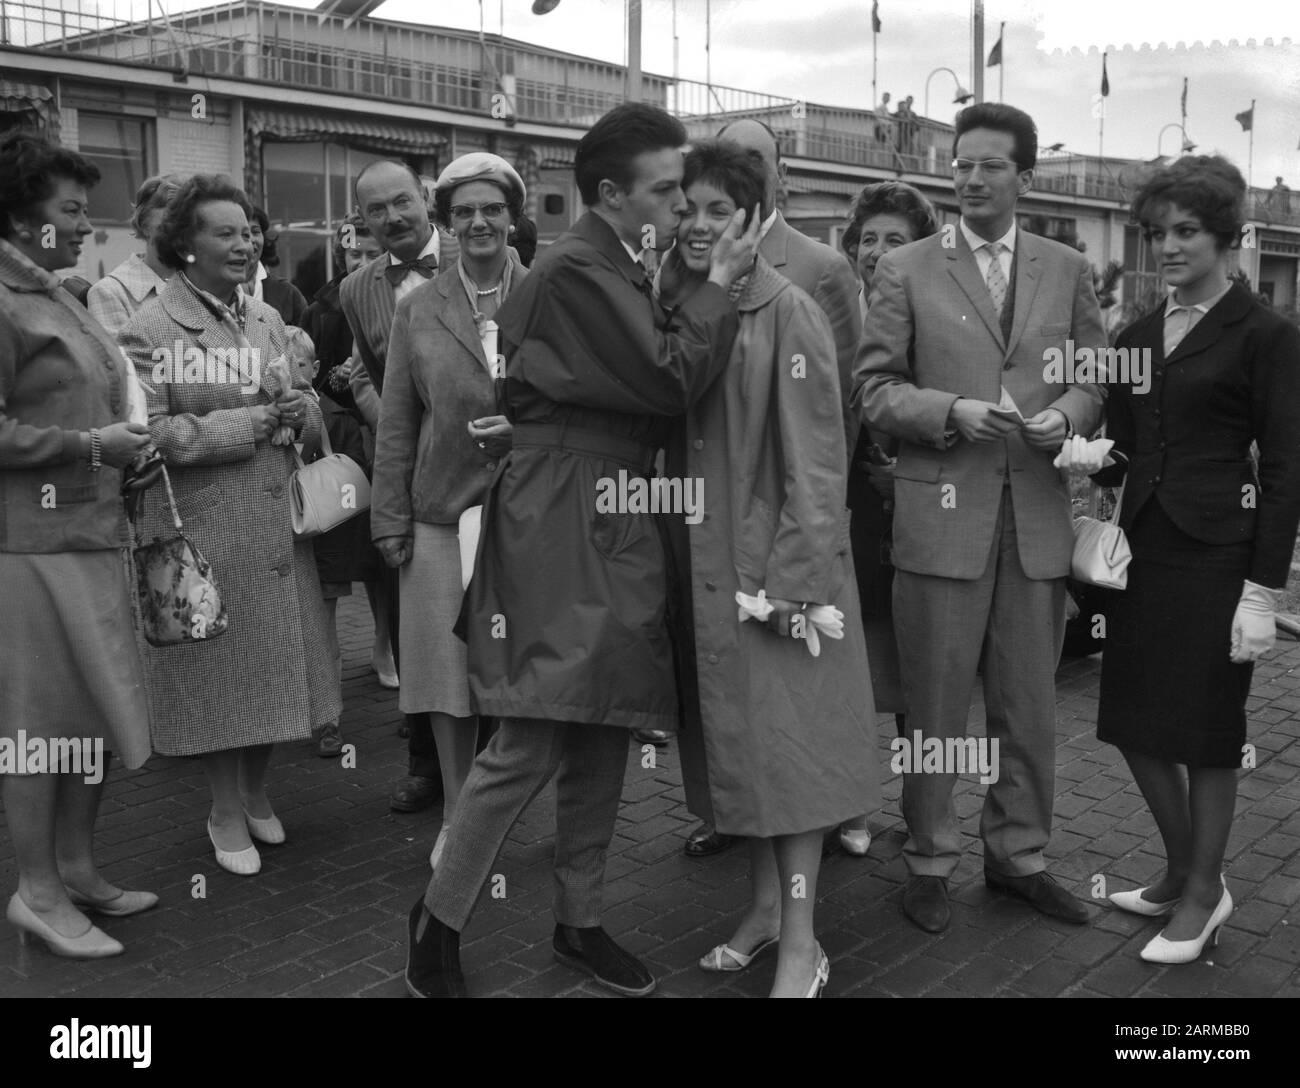 Departure Of Famous Fashion Designer Frans Molenaar To Paris Date September 27 1959 Location France Paris Keywords Departure Fashion Designers Personal Name Frans Molenaar Stock Photo 341582052 Alamy